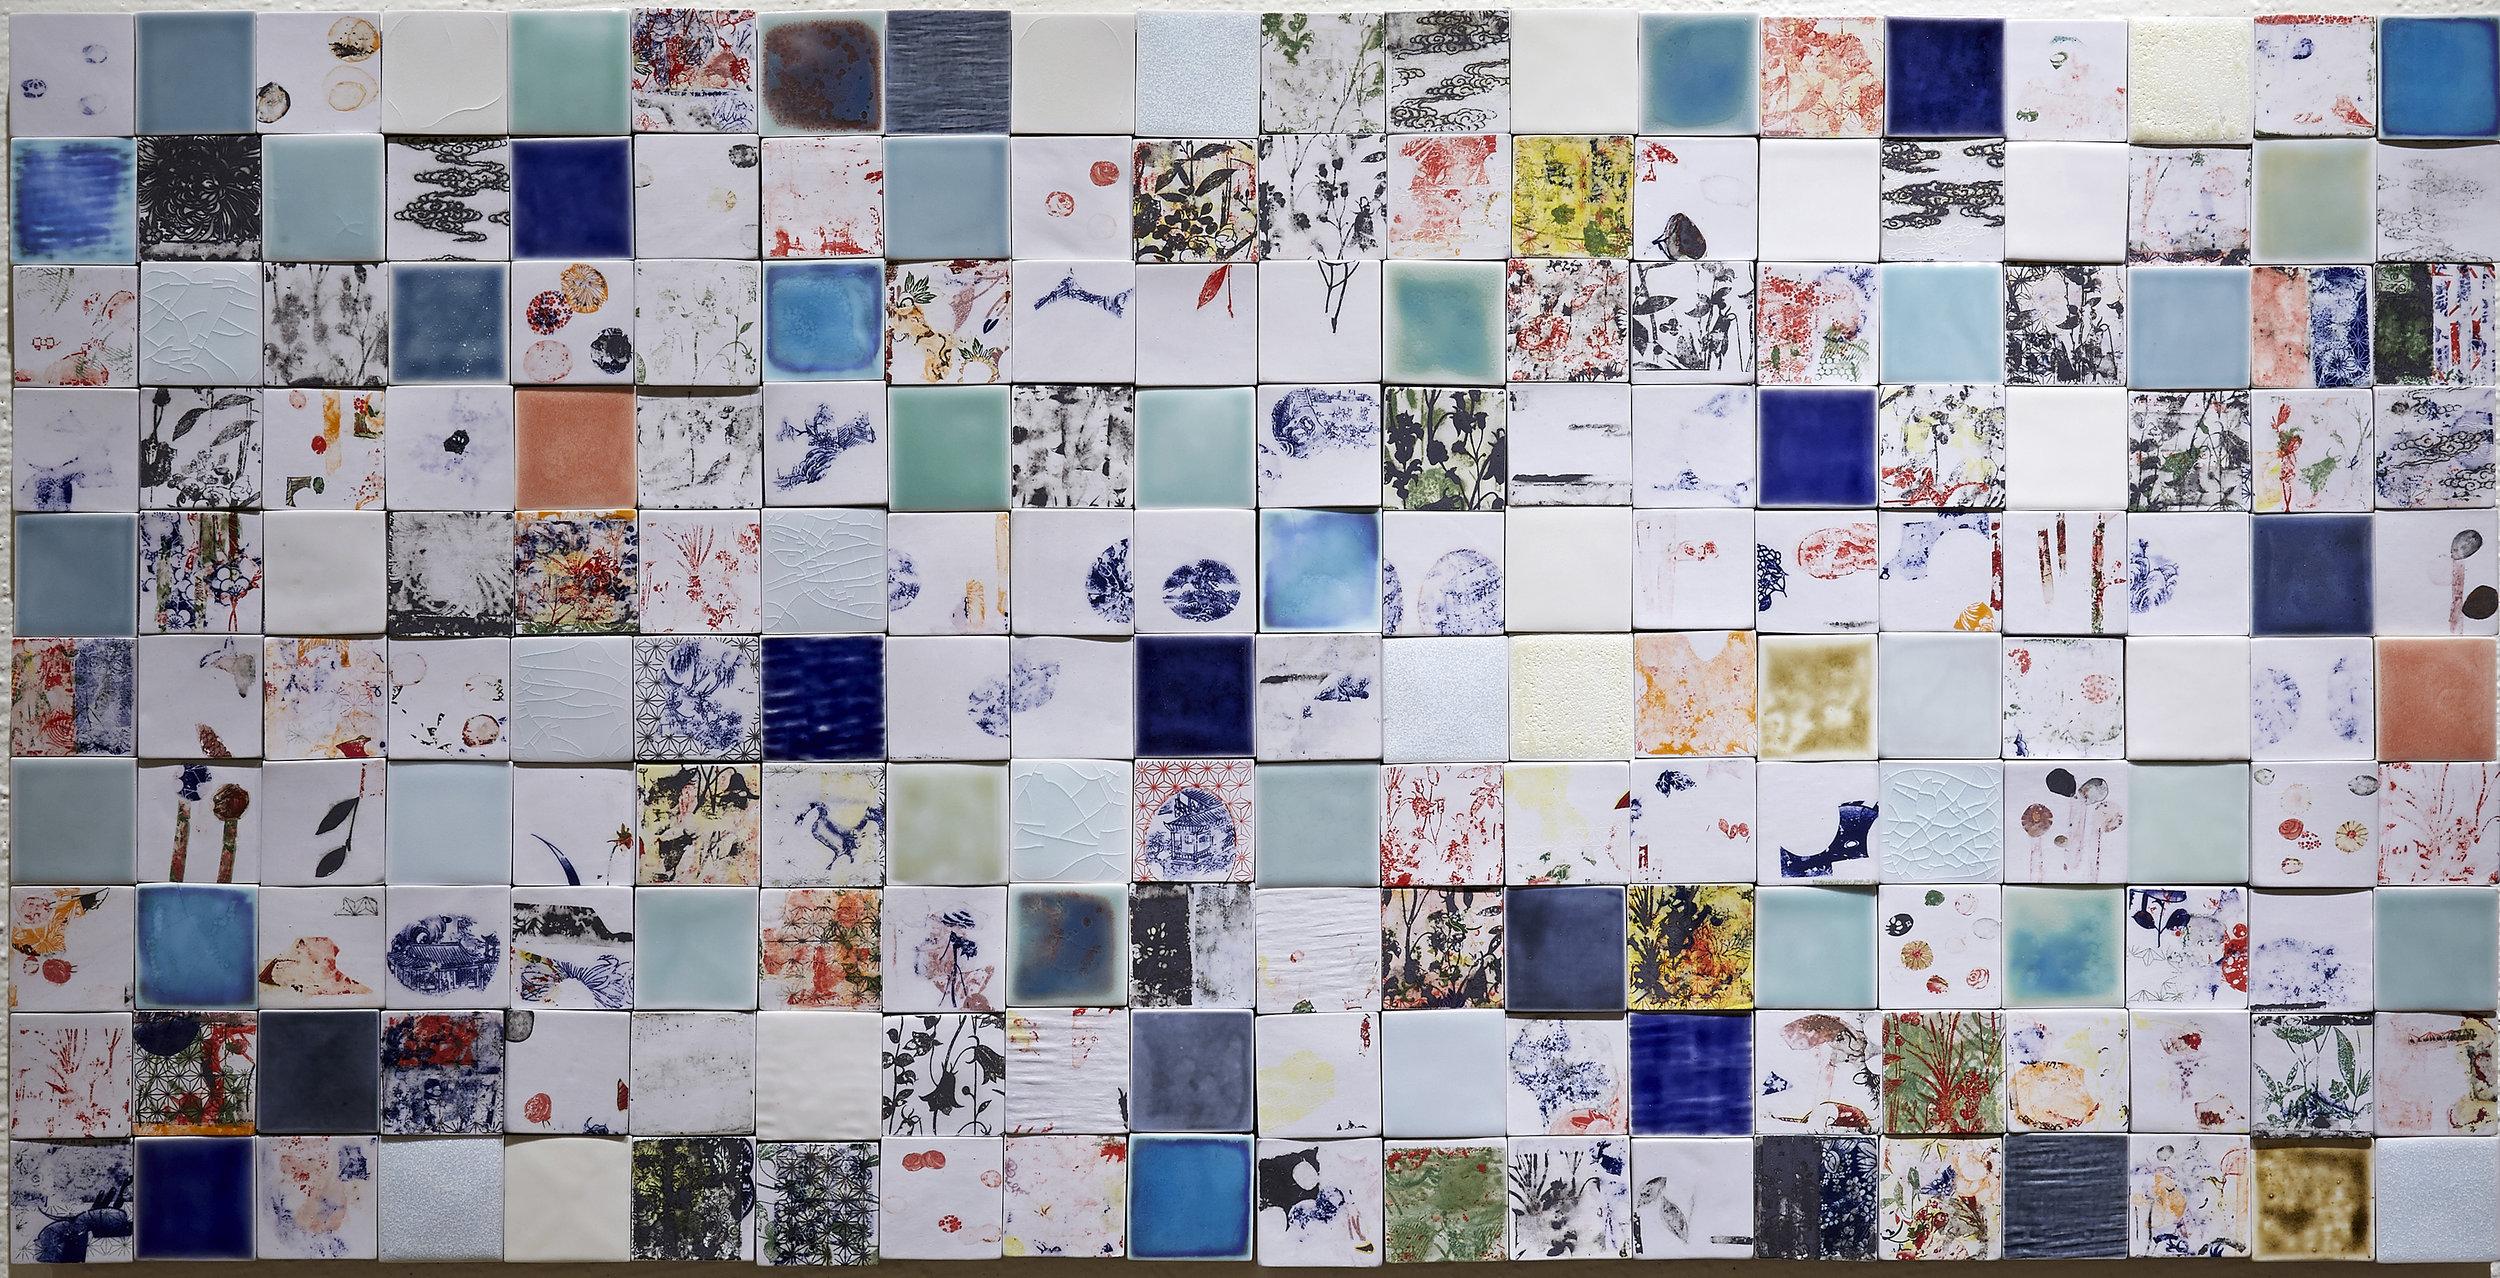 "<i>Fragments of Memory I</i>, 2016, porcelain, glaze, decal, h. 25 ½"" x w. 51"" x d. ½"""